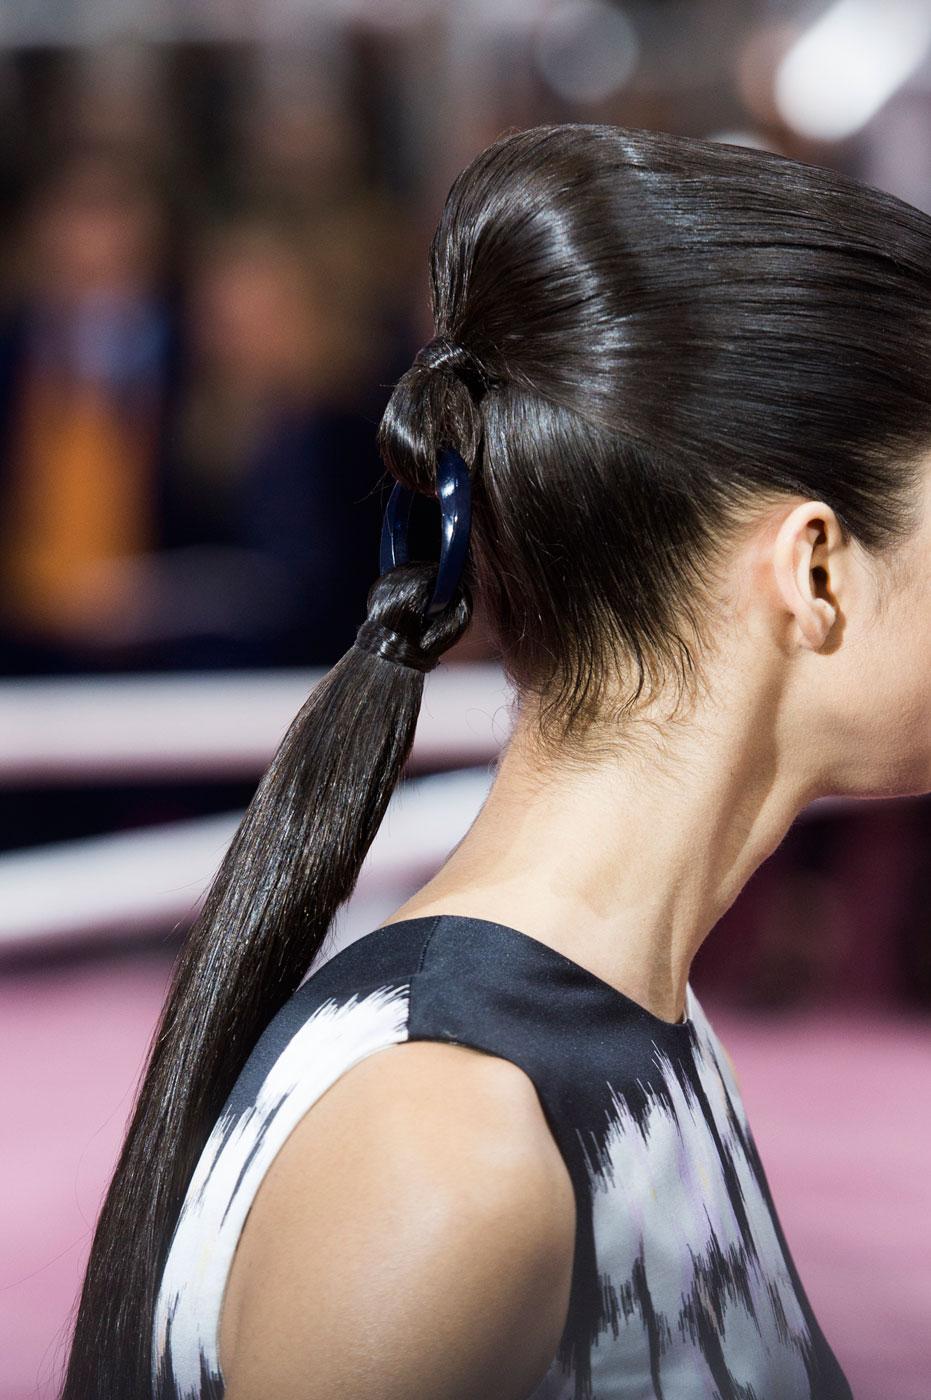 Christian-Dior-fashion-runway-show-close-ups-haute-couture-paris-spring-summer-2015-the-impression-184